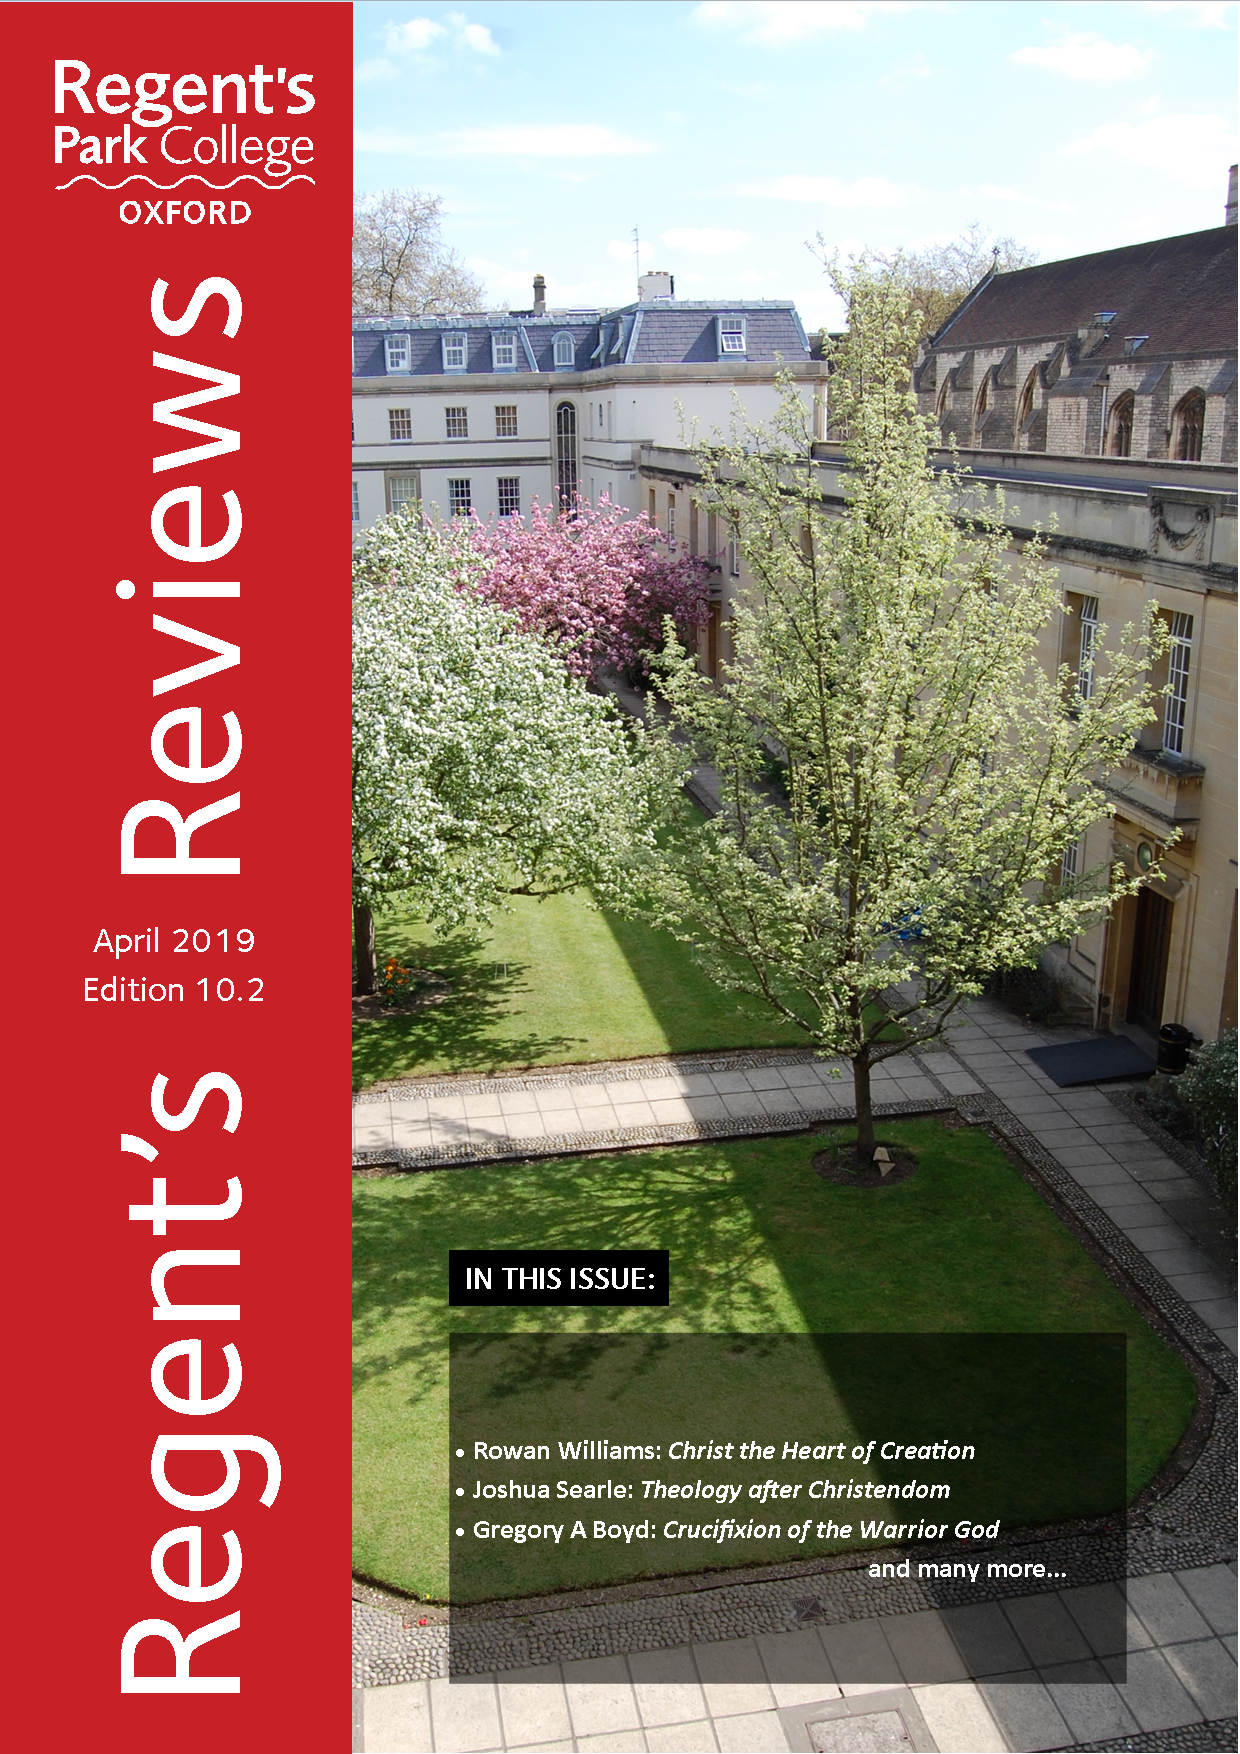 10.2 April 2019 cover